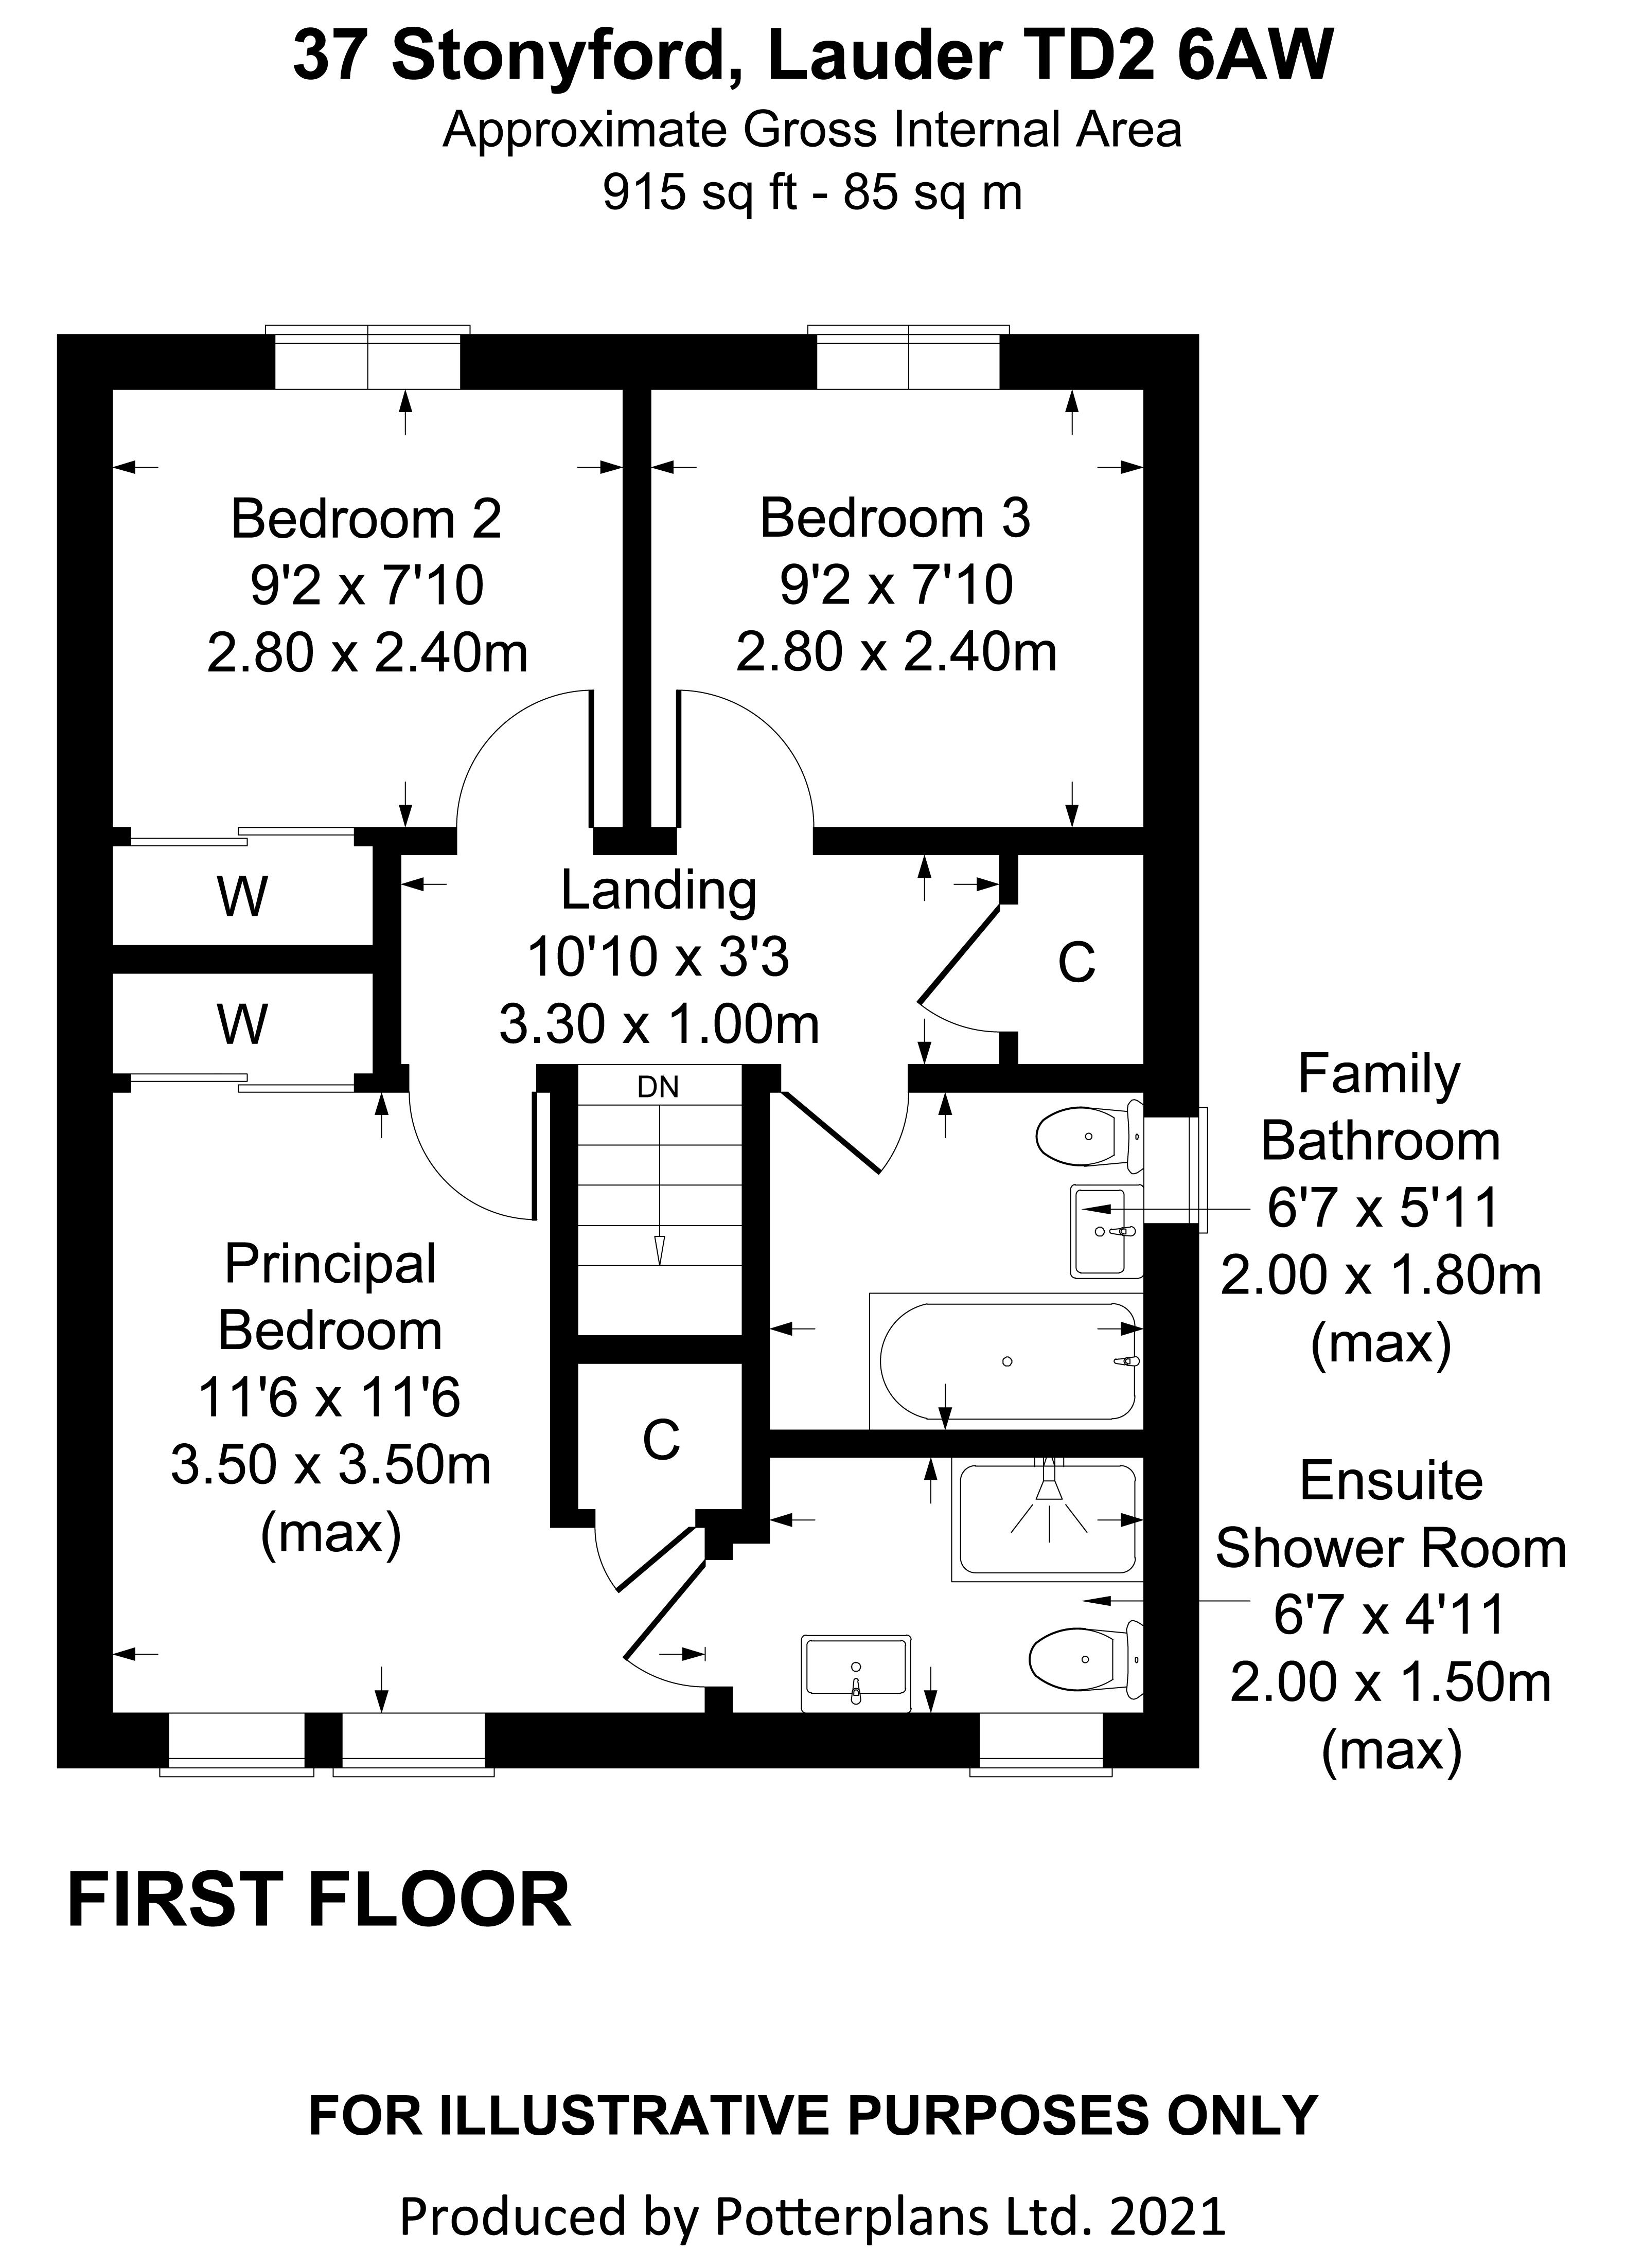 37 Stonyford First Floor